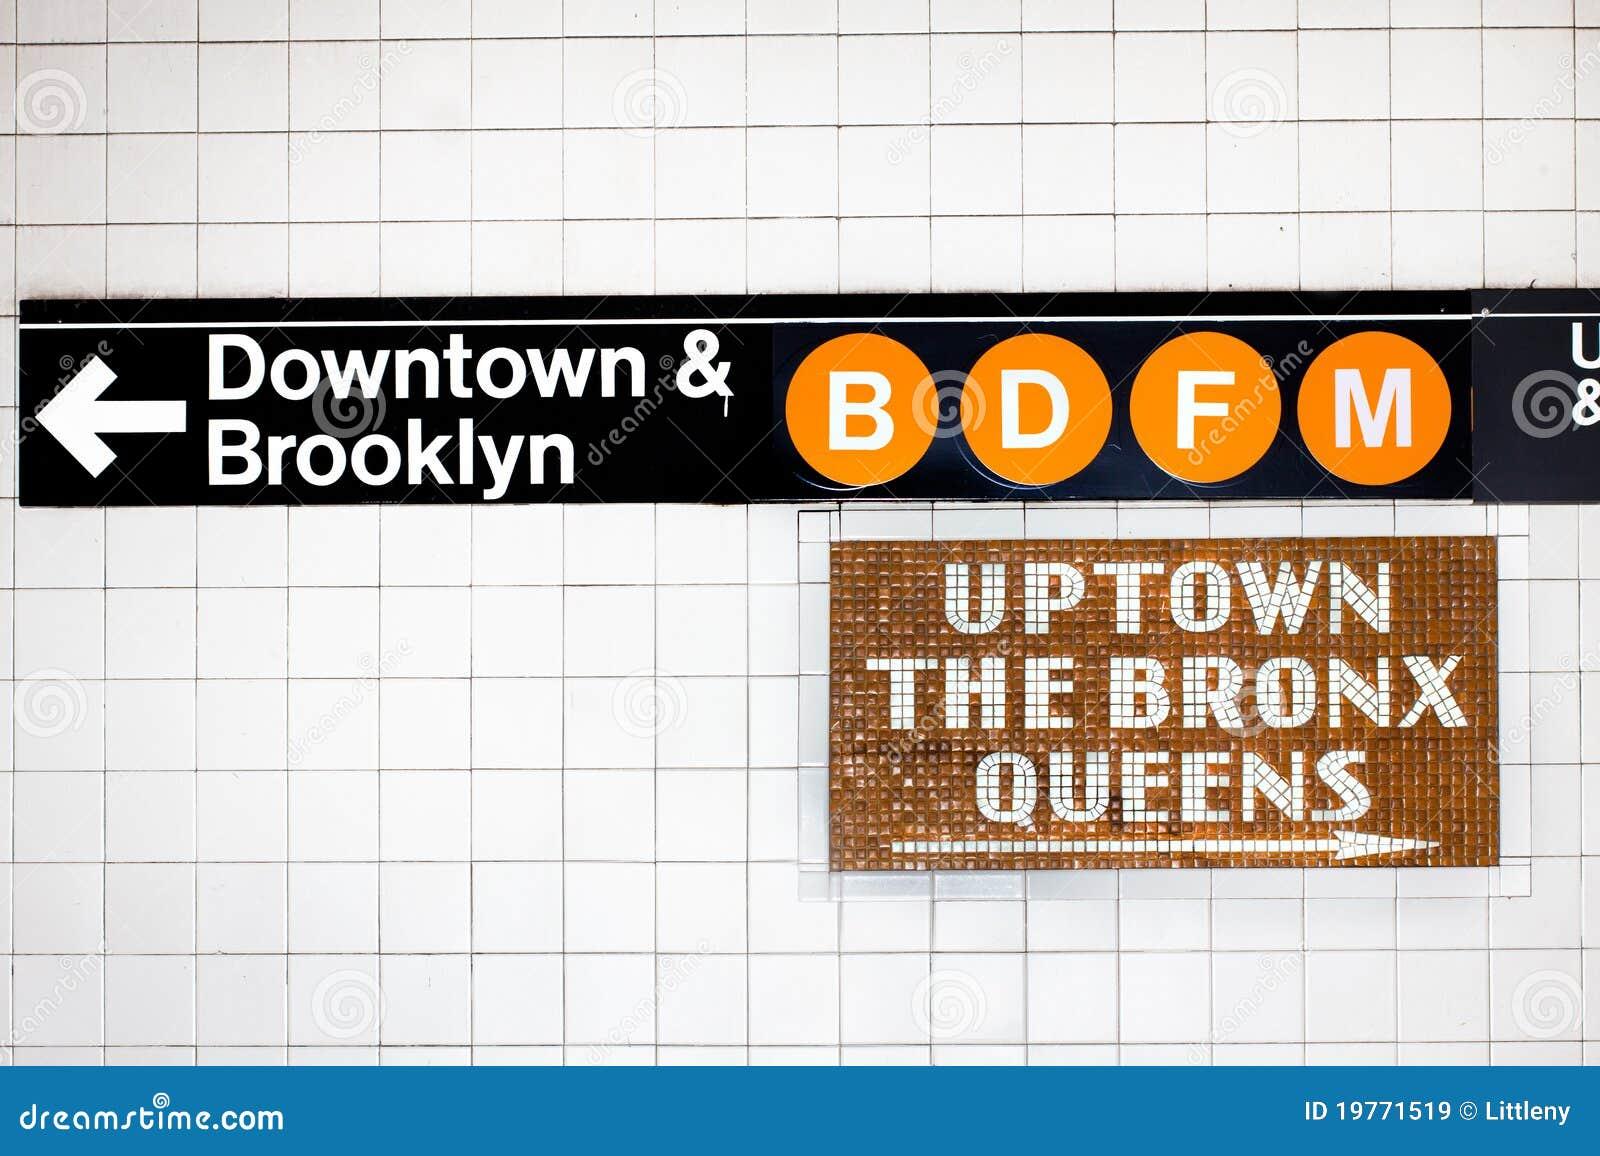 NYC Subway Sign stock image. Image of street, manhattan - 19771519